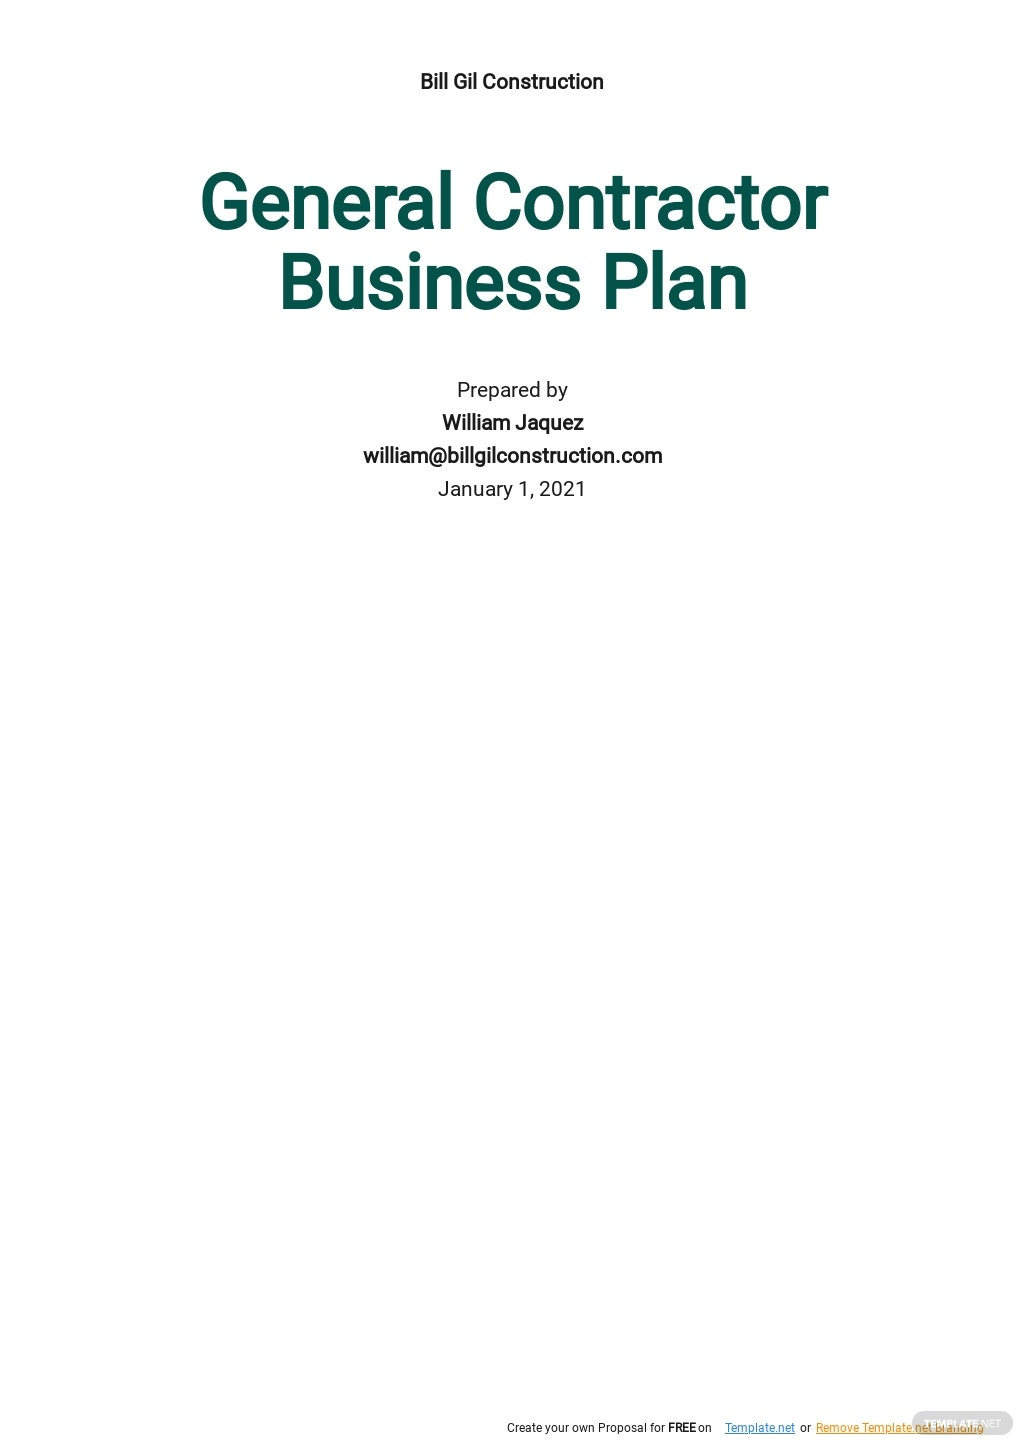 General Contractor Business Plan Template.jpe